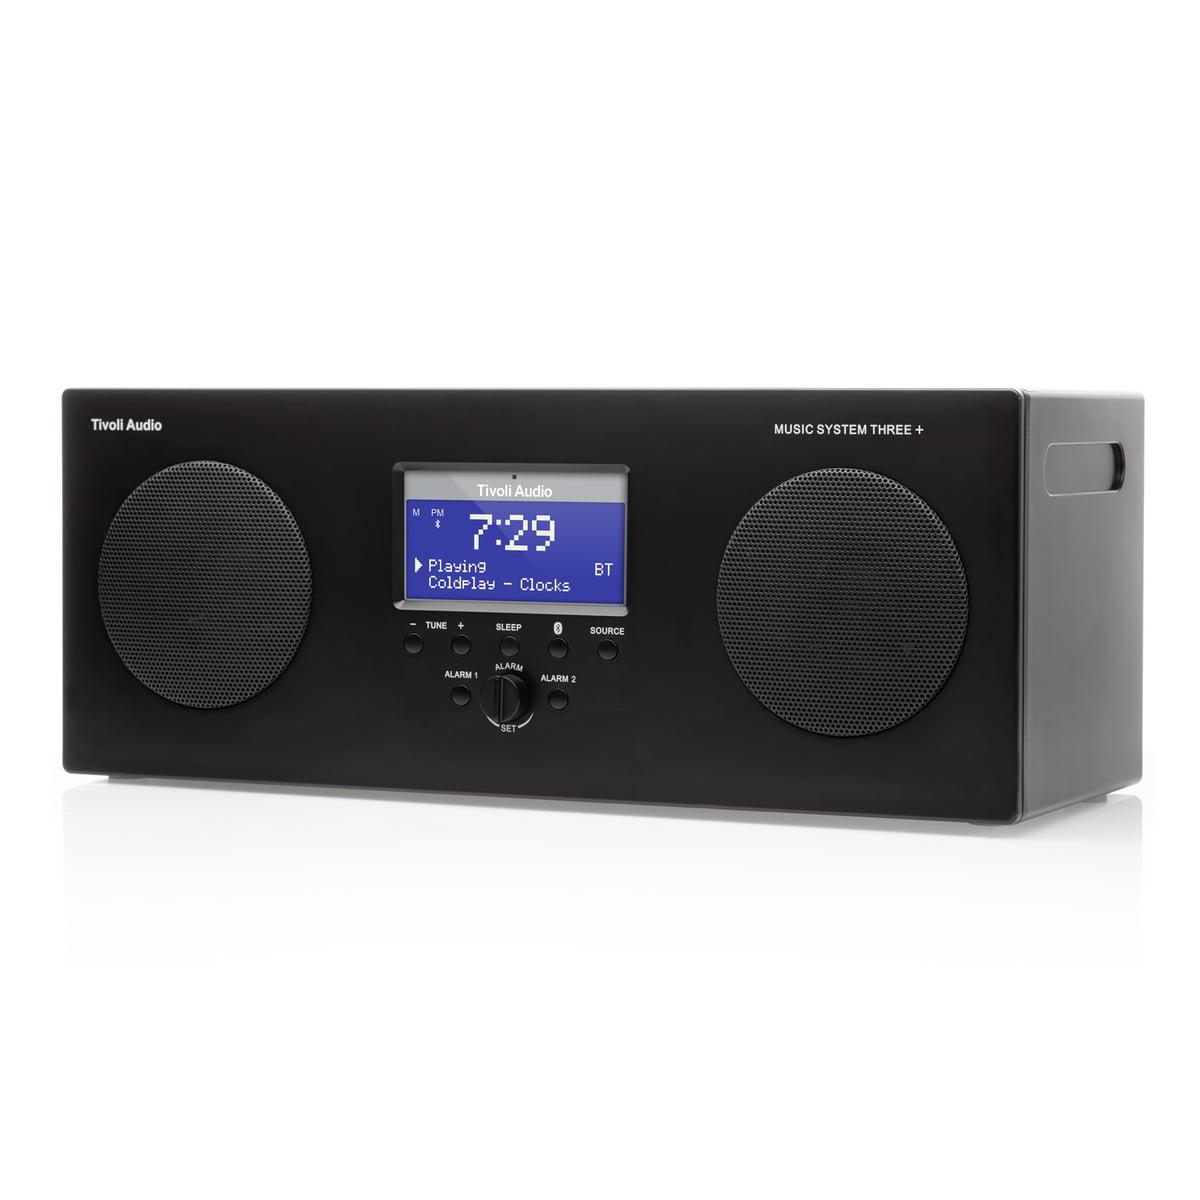 tivoli audio music system 3. Black Bedroom Furniture Sets. Home Design Ideas